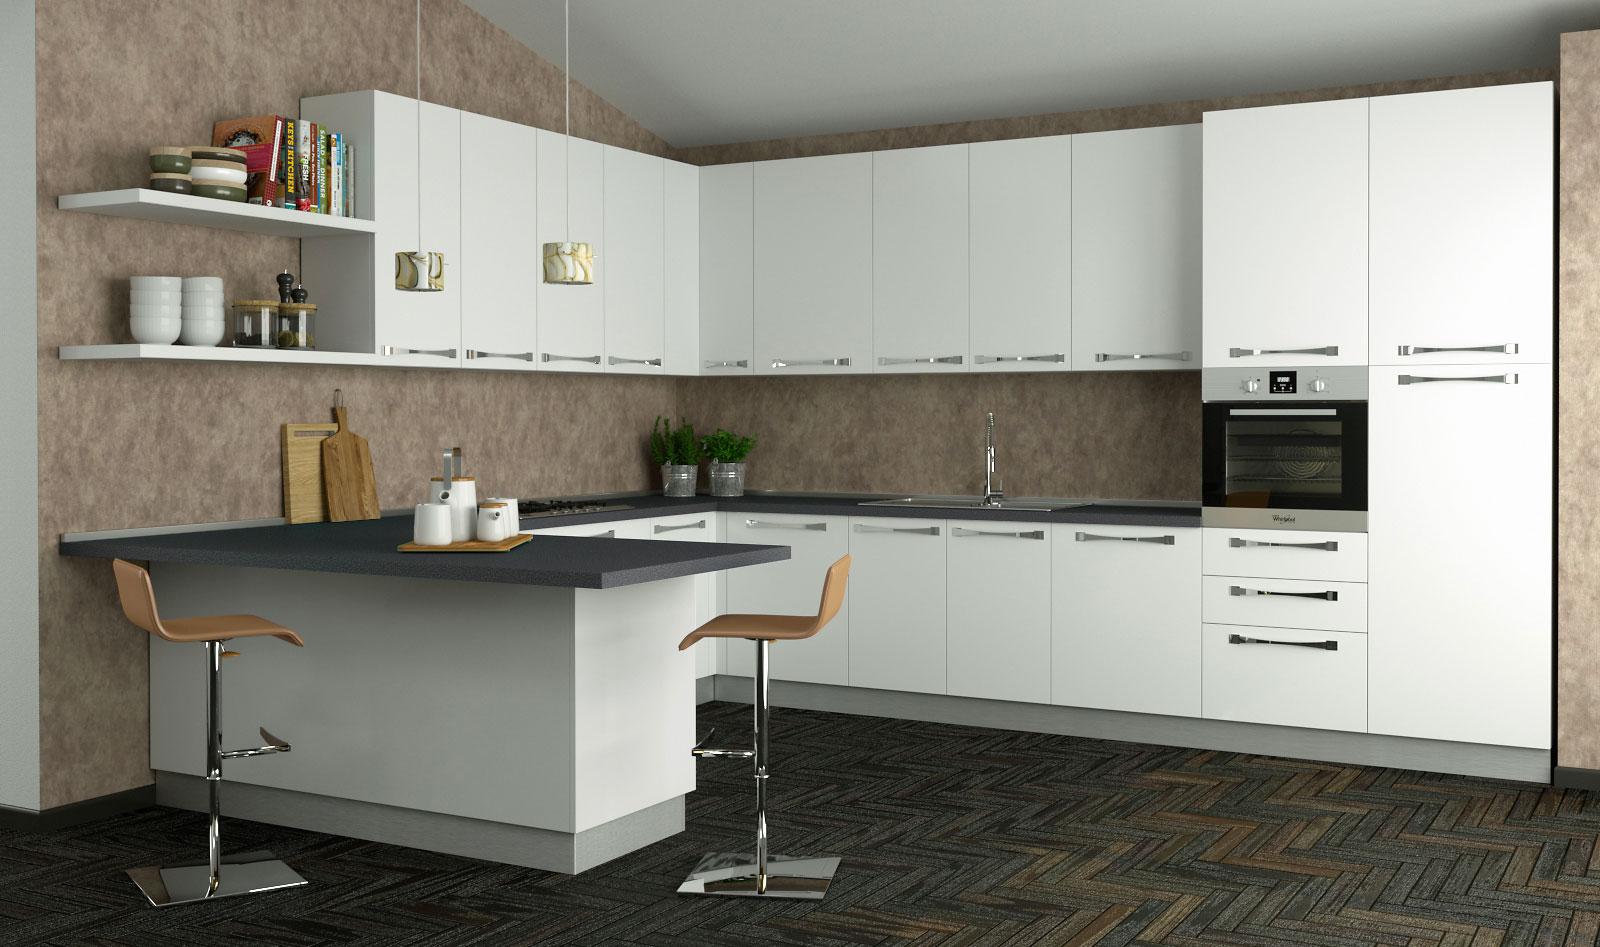 Cucine componibili sistema 901 arredaclick - Ante per cucine componibili ...